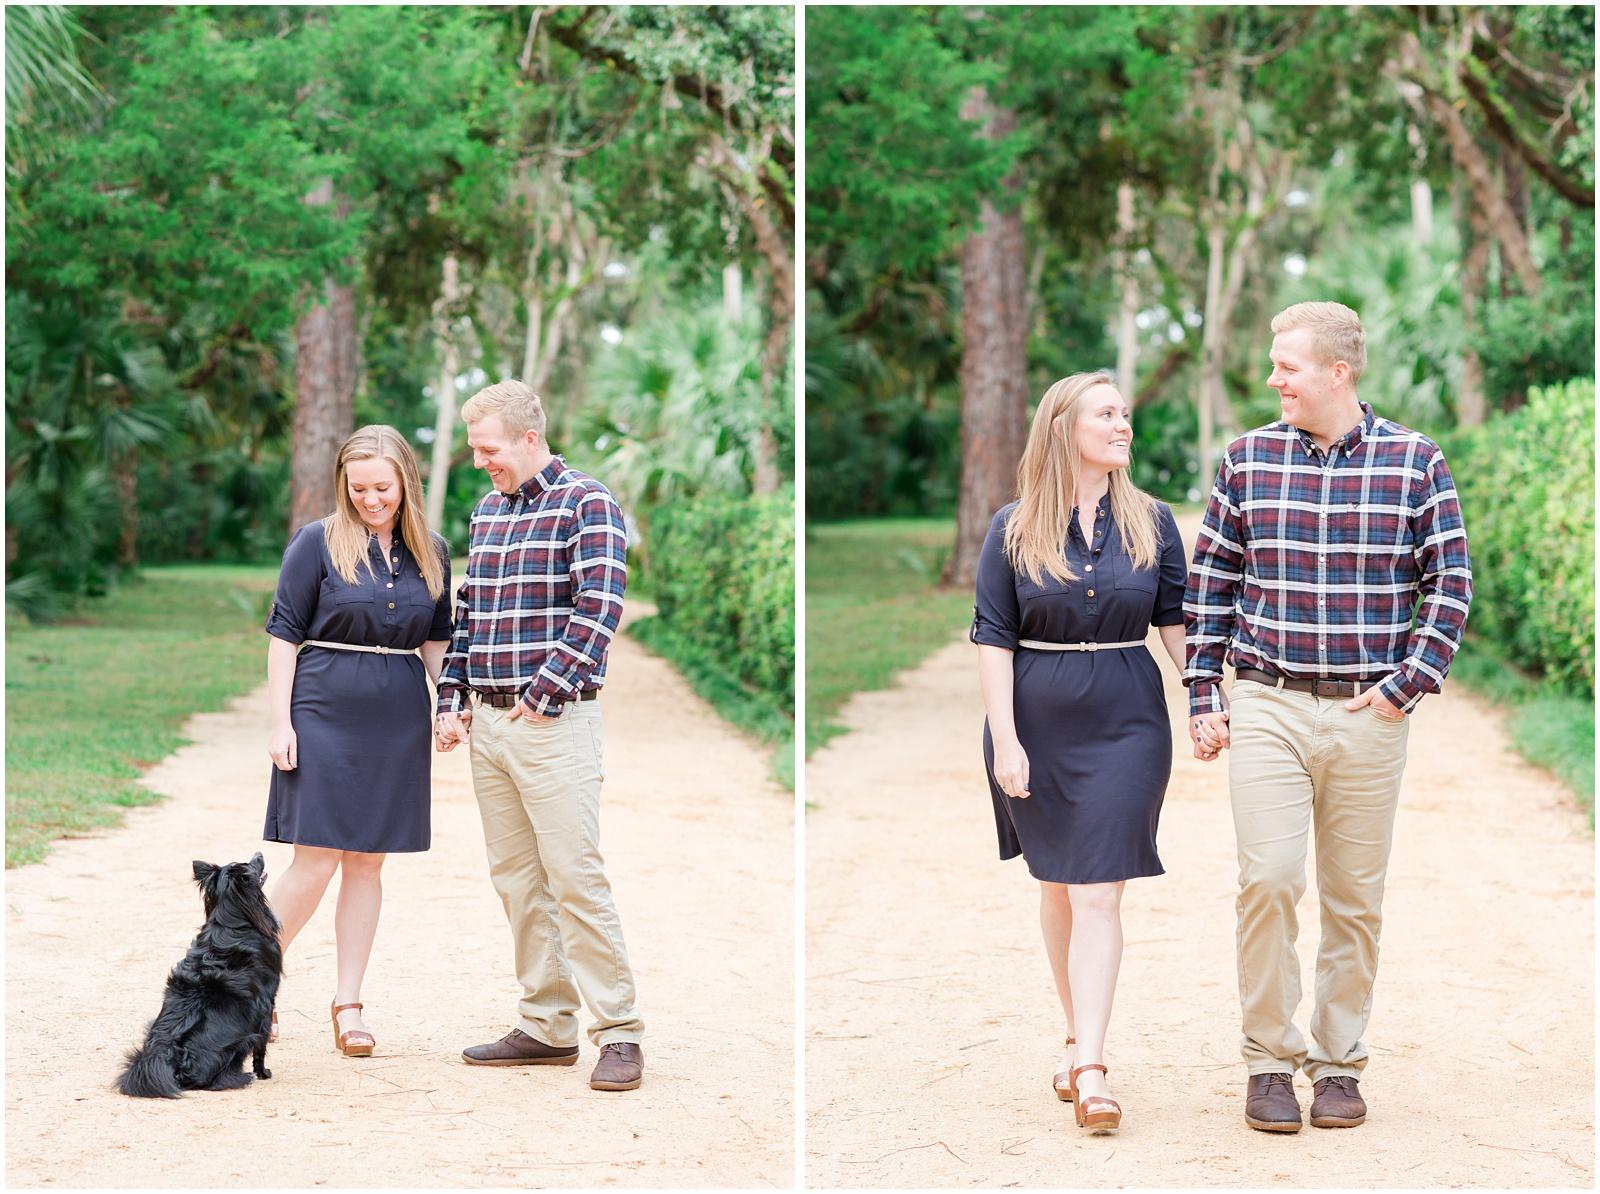 Palm Coast_Washington Oaks Garden_State Park_Engagement_Portraits_6.jpg